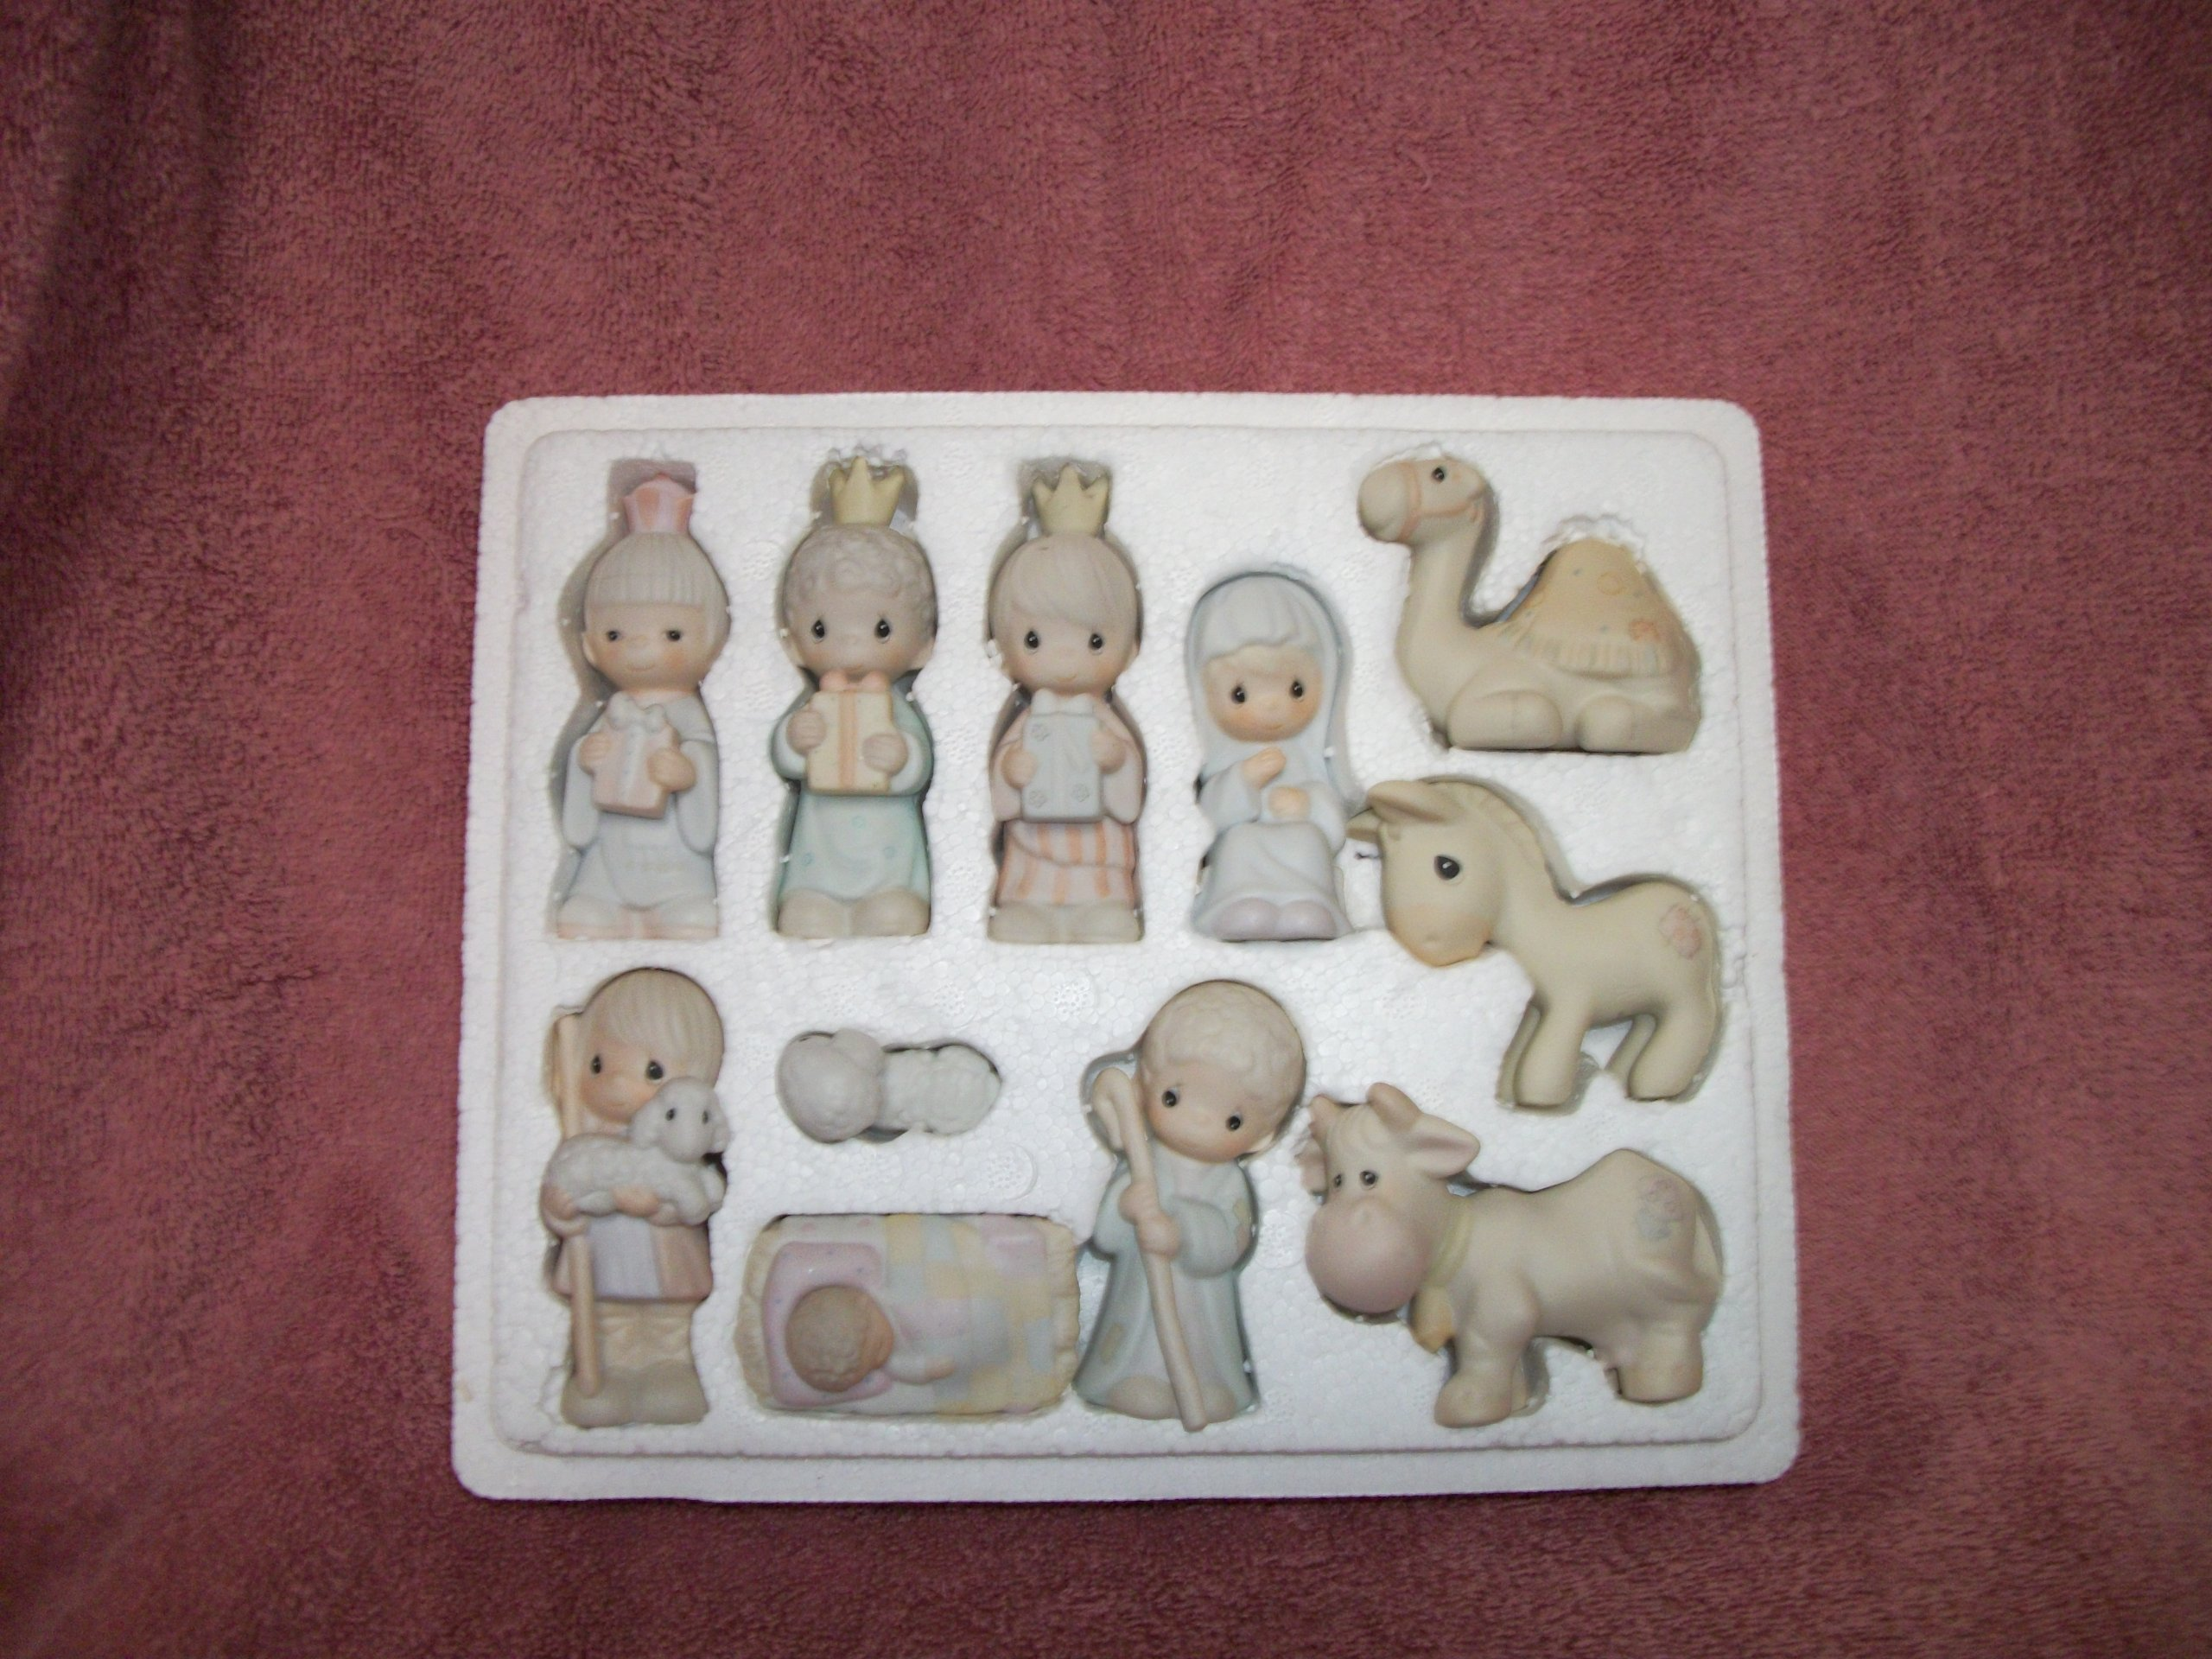 Precious Moments Set of 11 Mini Nativity Figurines